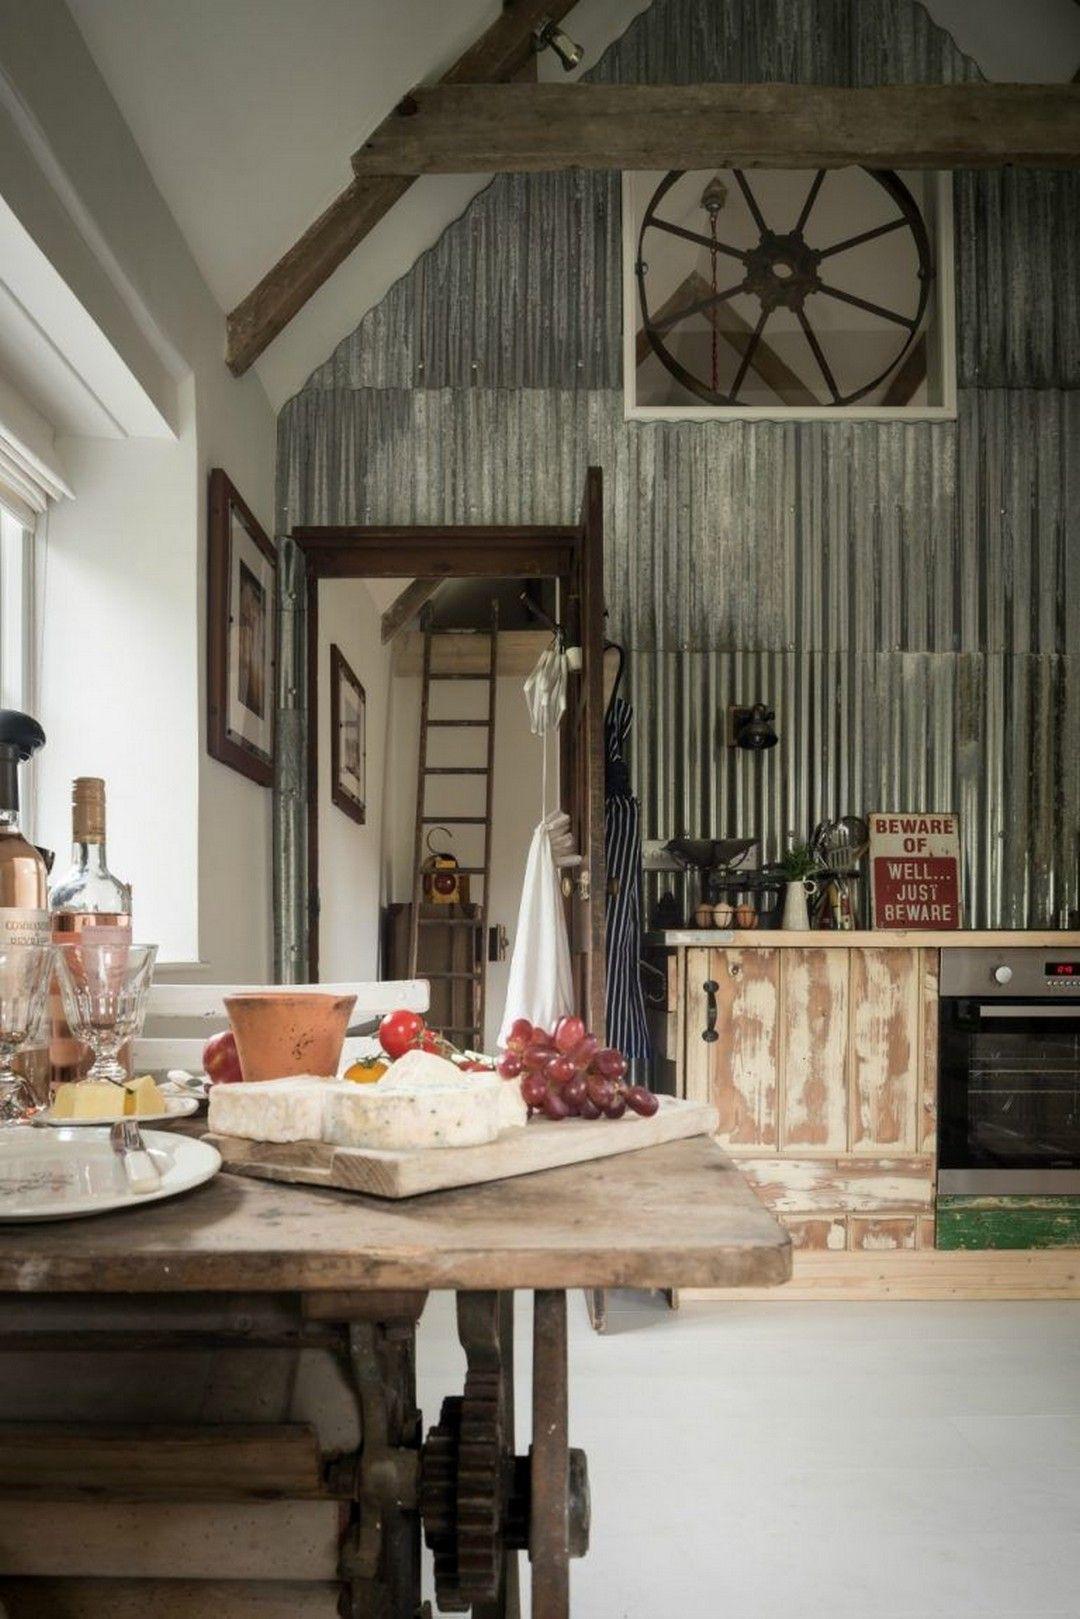 27 Awesome Industrial Farmhouse Design Ideas #industrialfarmhouse